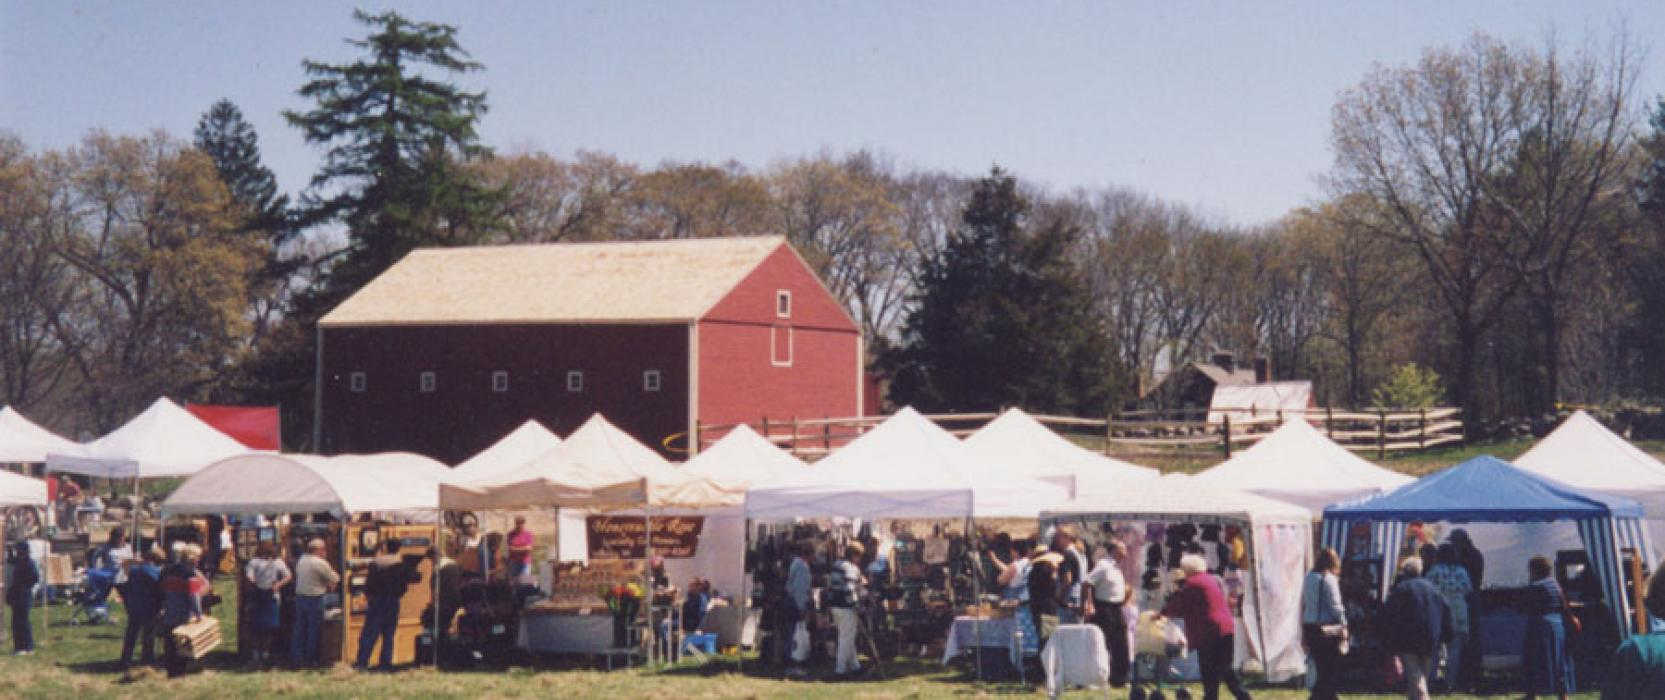 Autumn Arts & Crafts Festival at the Wayside Inn Sunday, Sept. 13